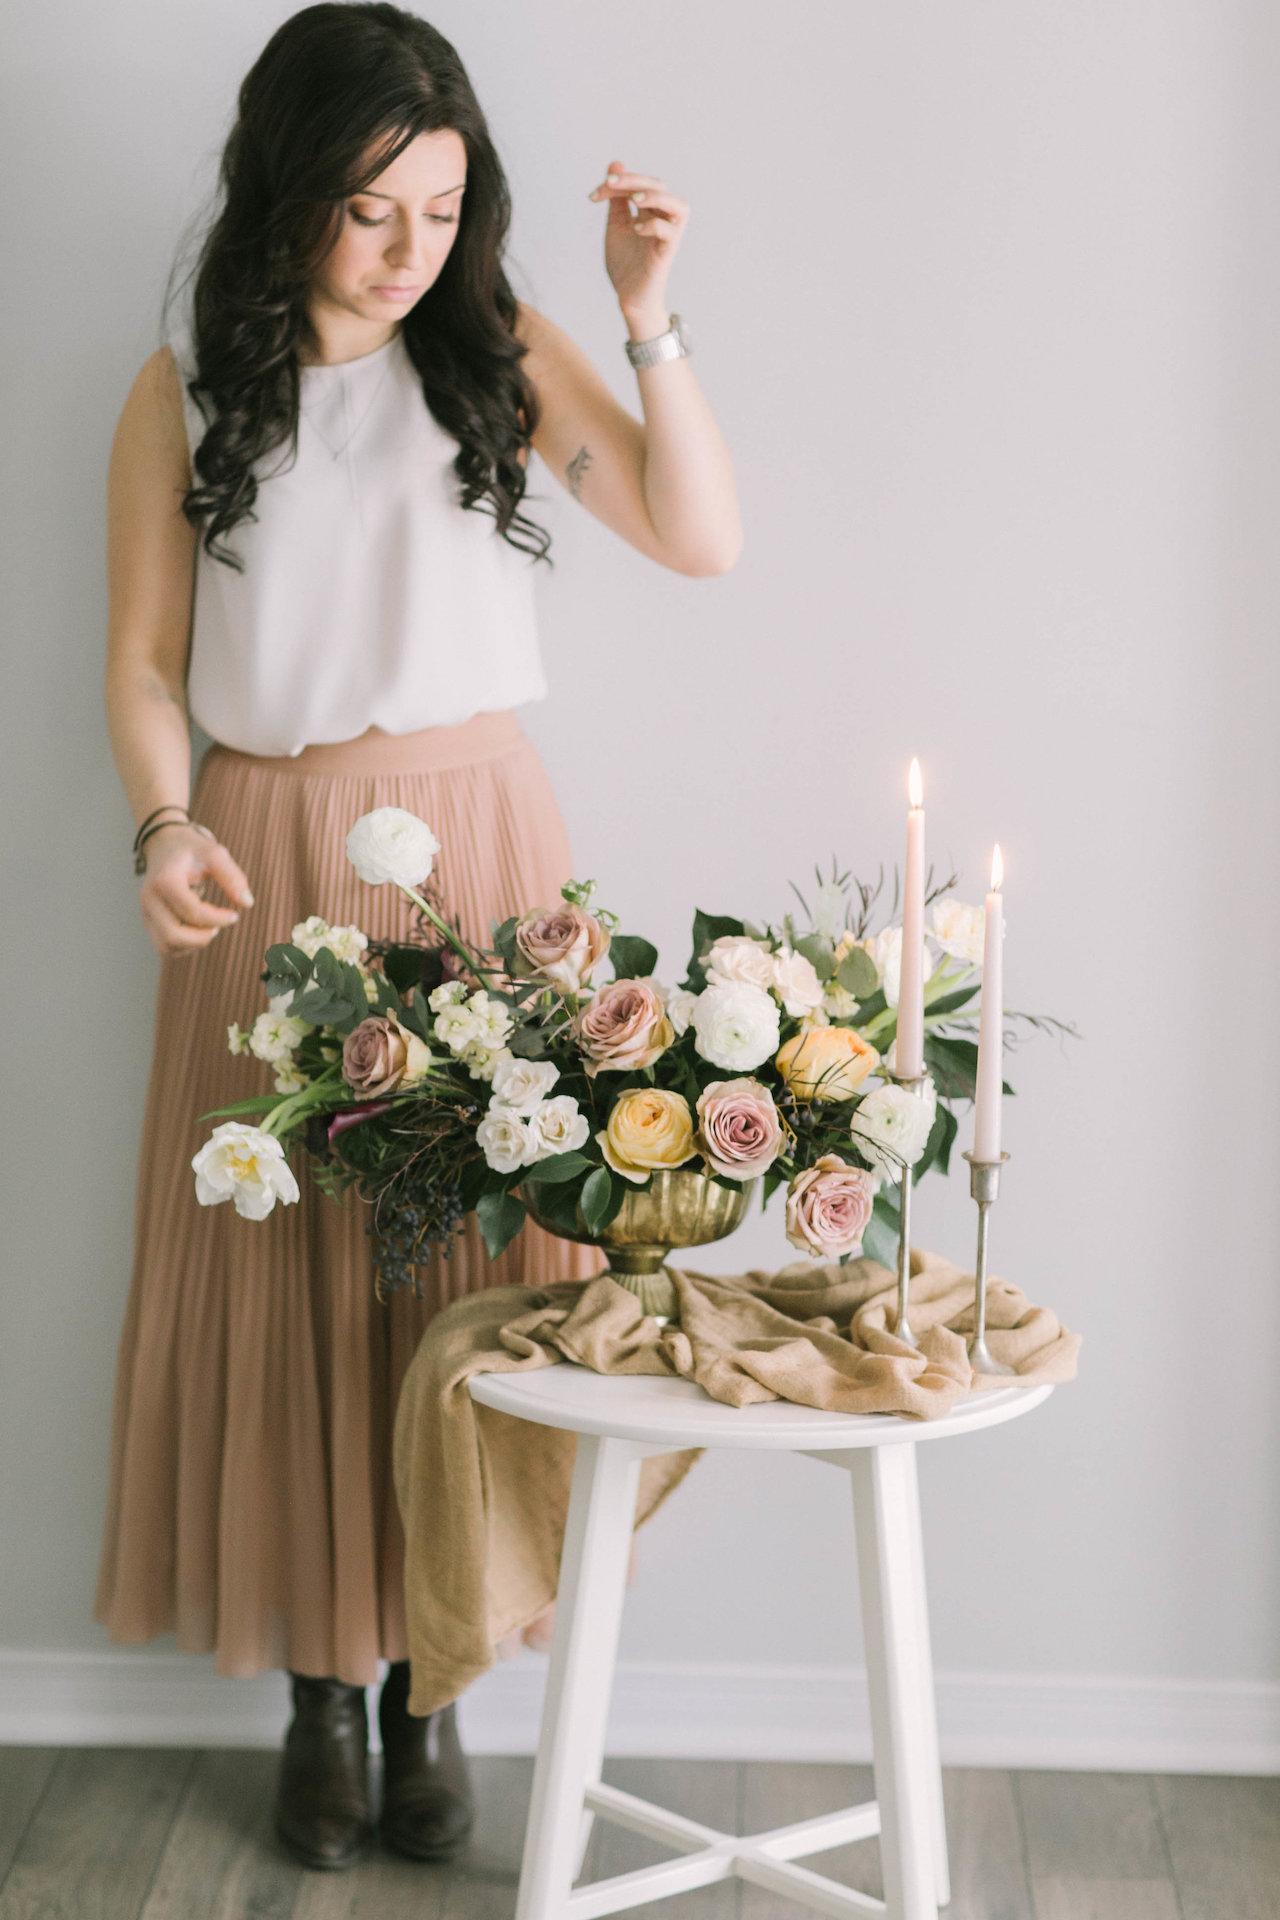 Rikki and flowers